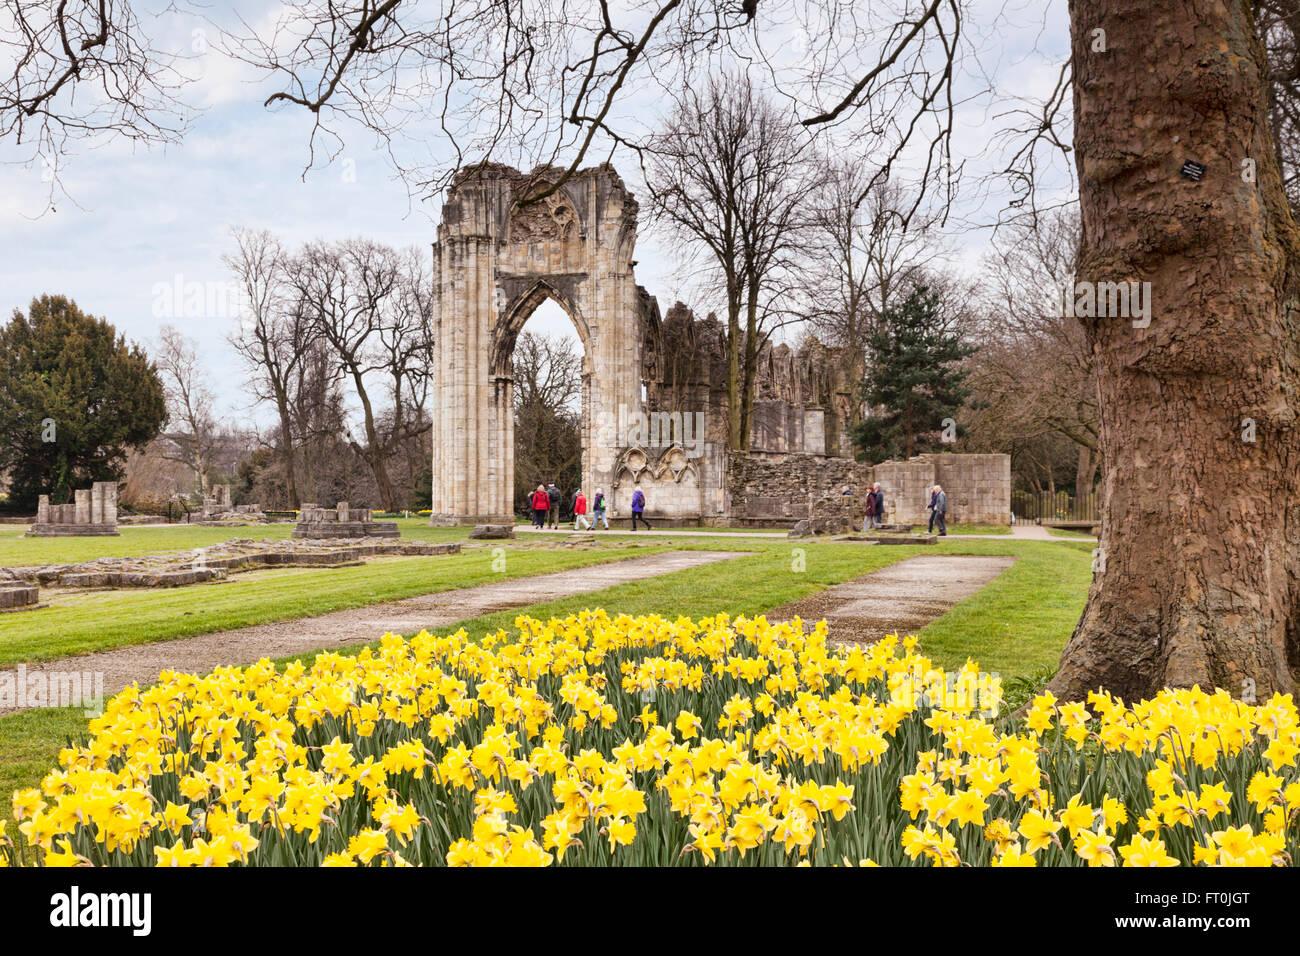 Groupe de touristes explorer St Mary's Abbey, York, North Yorkshire, Angleterre, Royaume-Uni Photo Stock